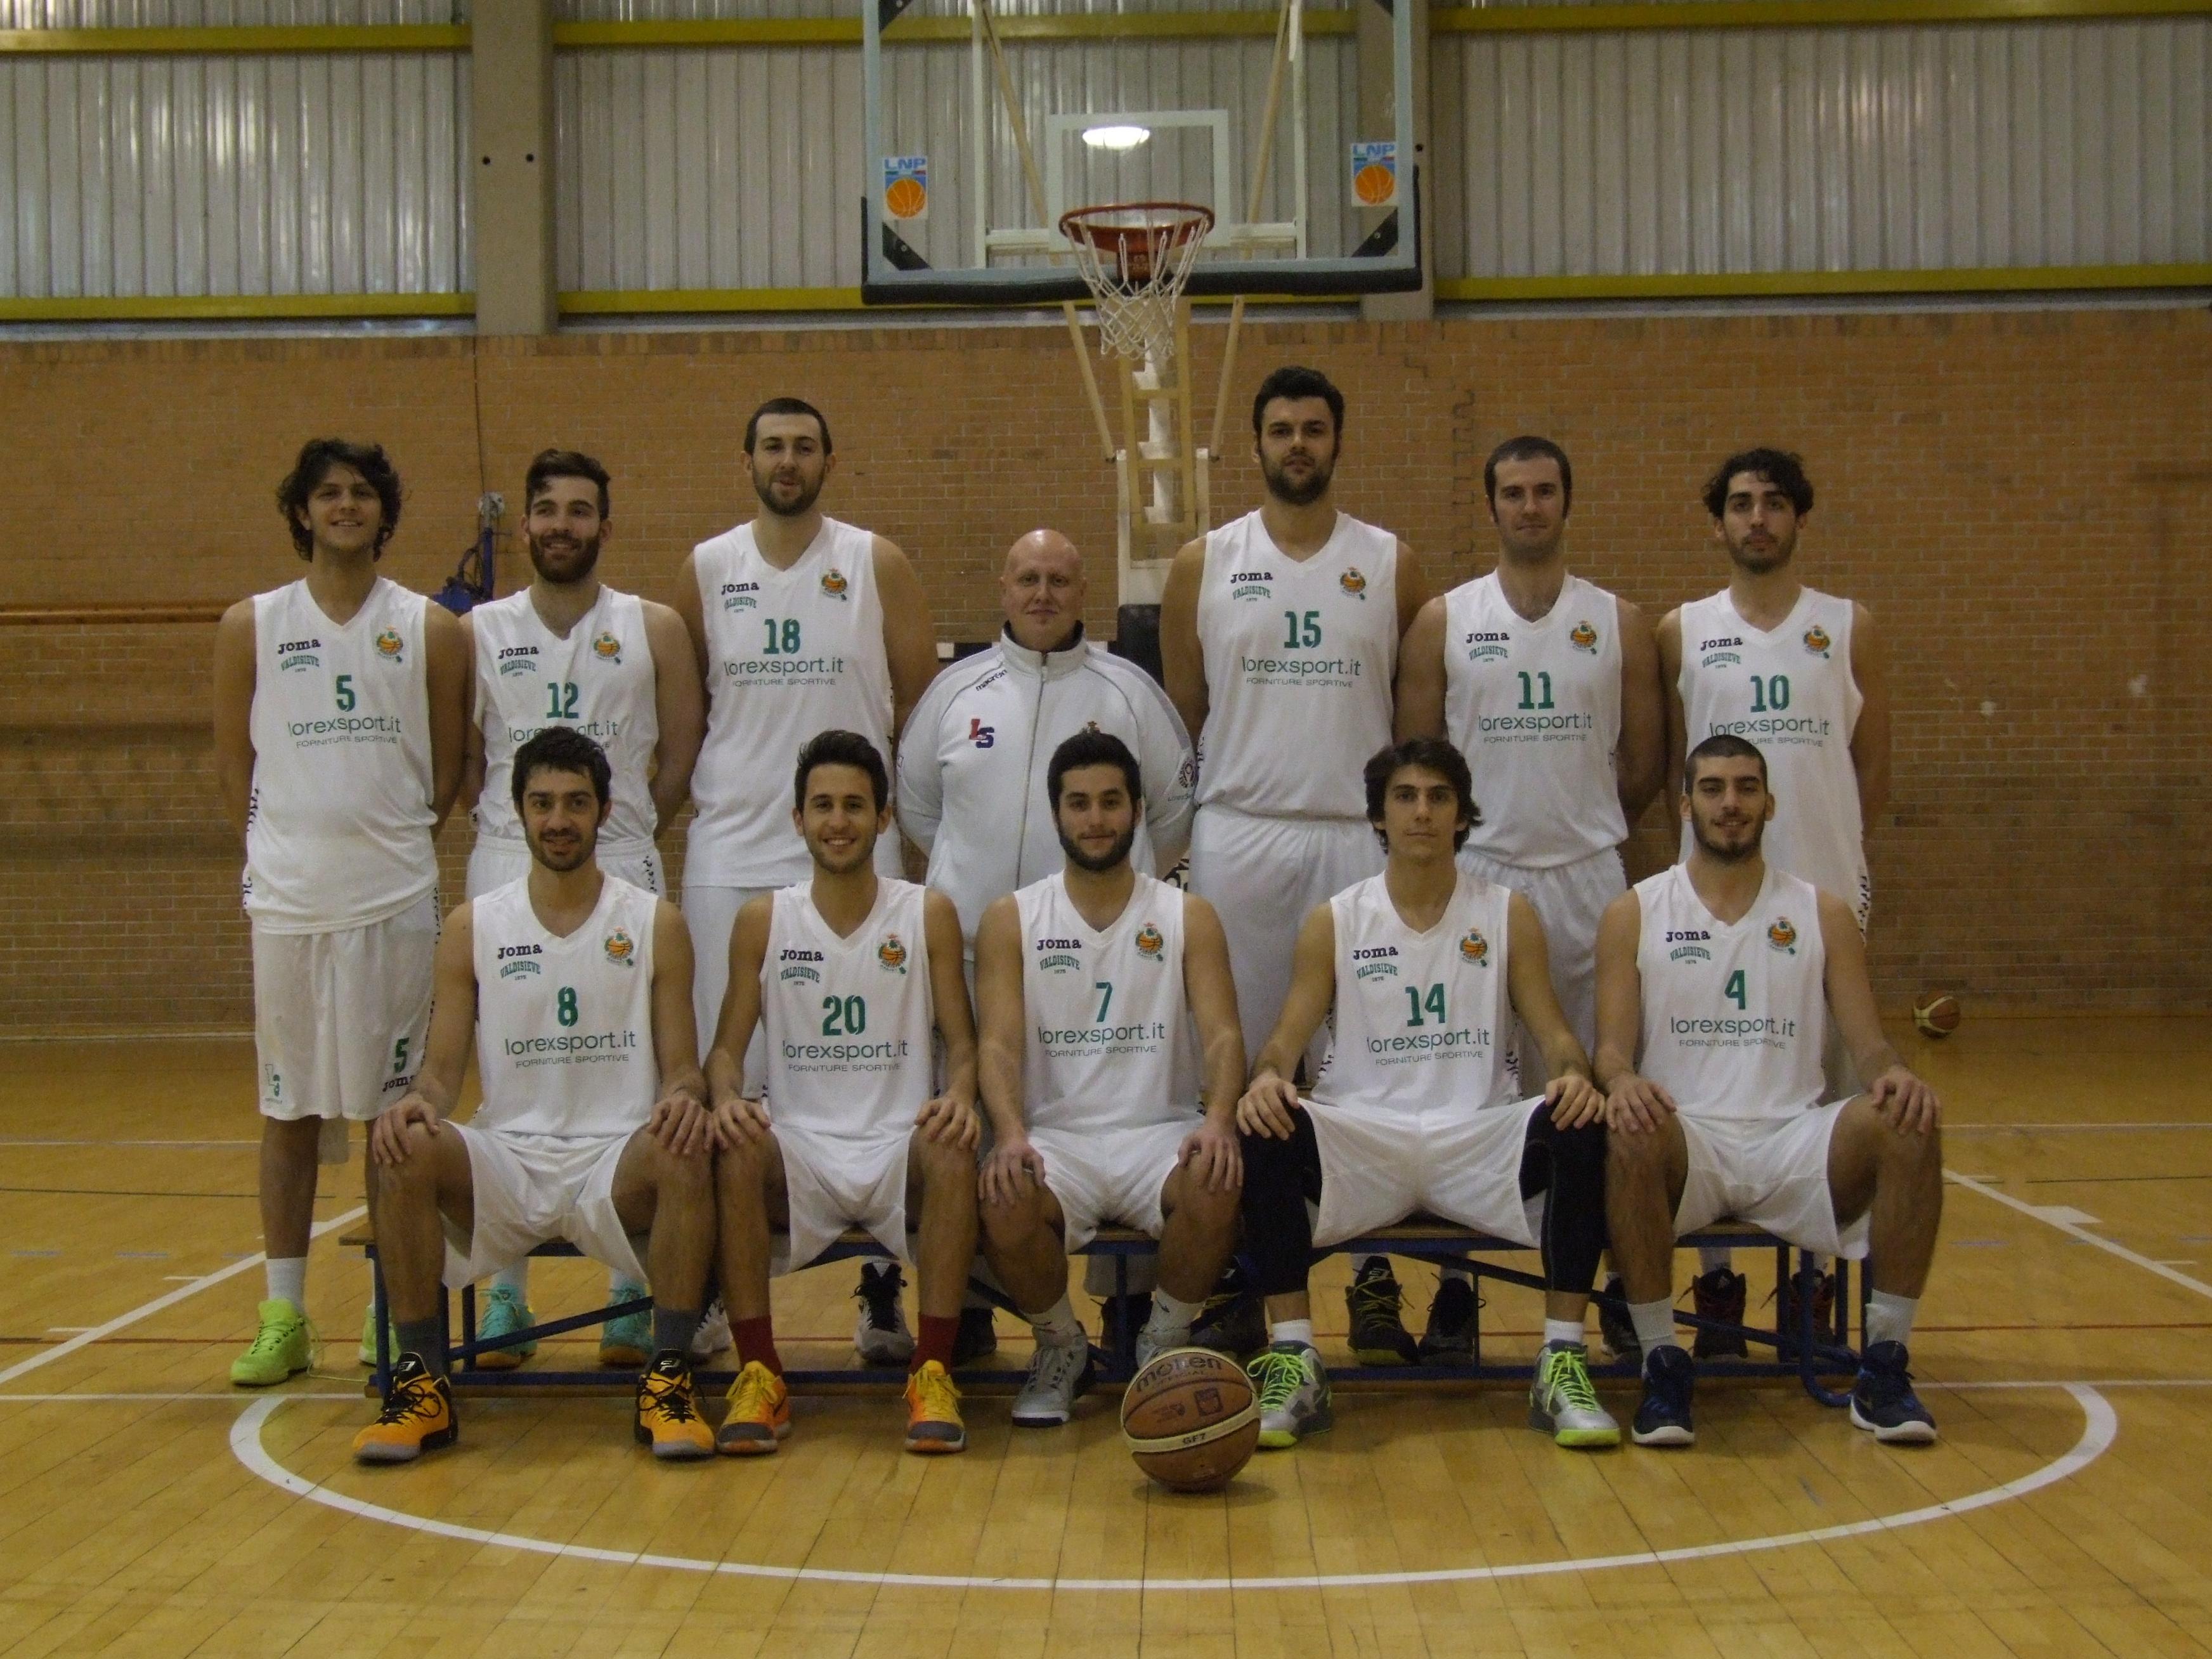 Lorex Sport Valdisieve-ABC Castelfiorentino 95-60